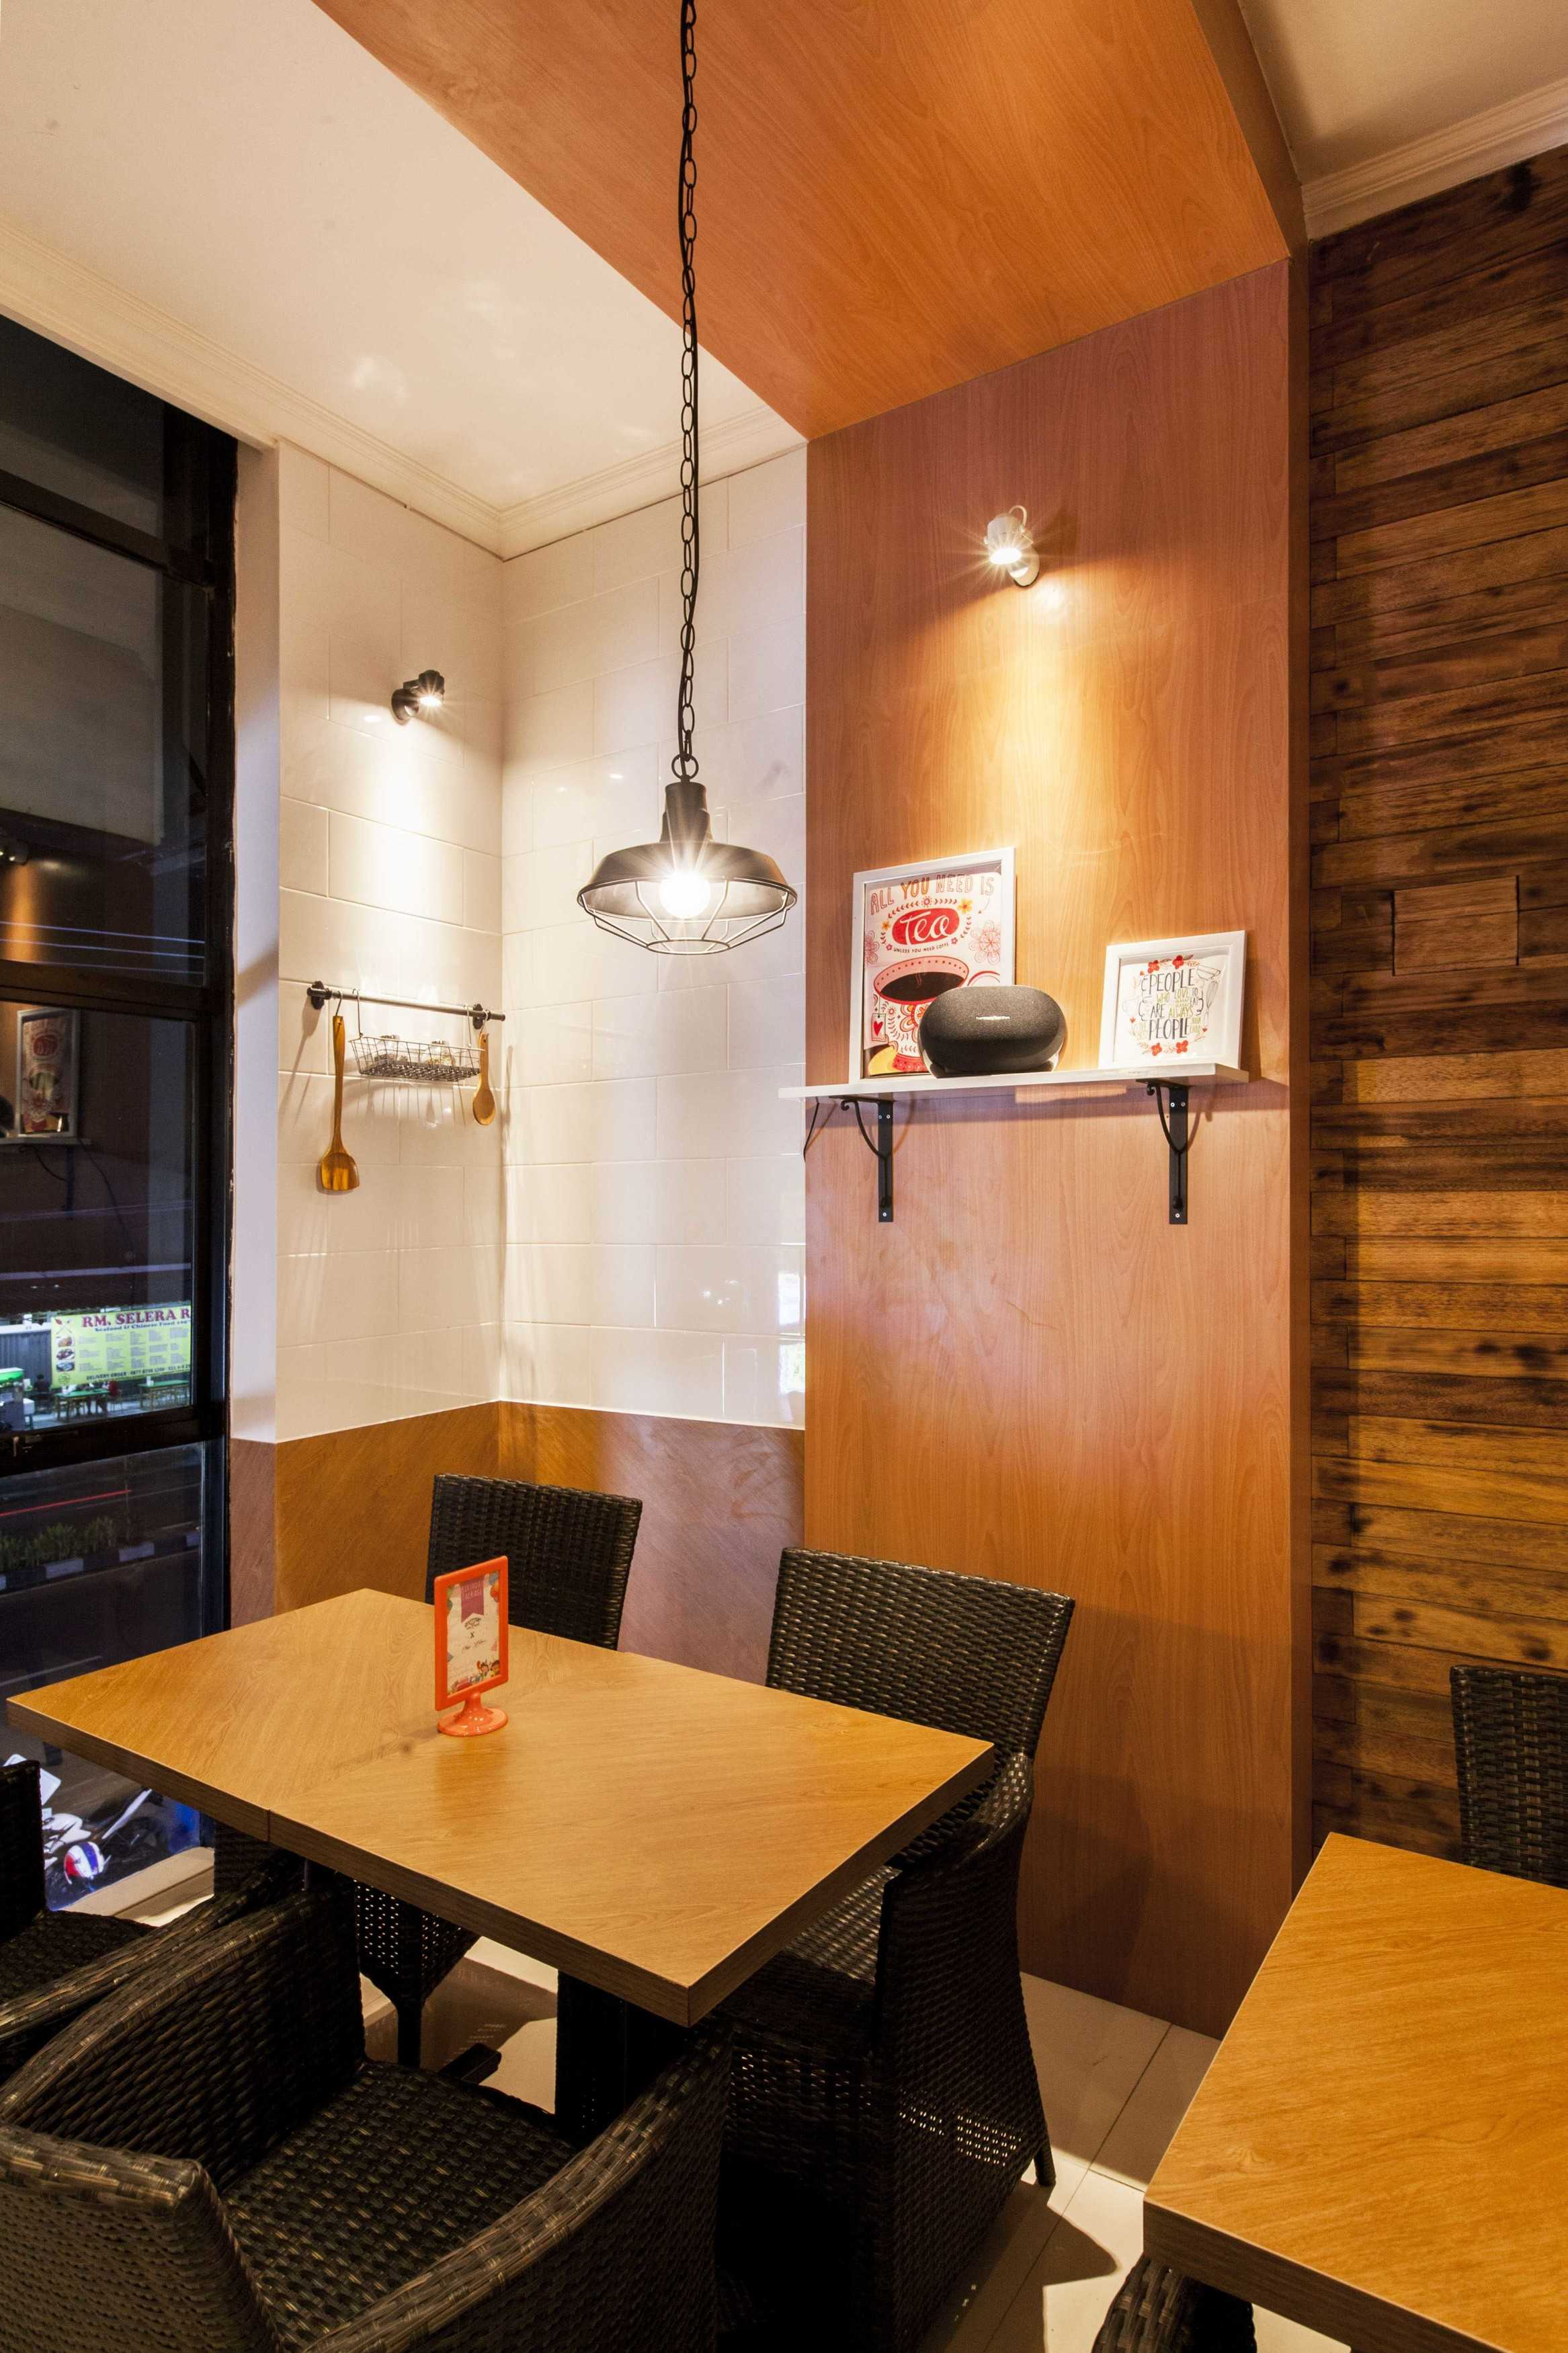 Yardd D'kitjen Cafe Tangerang, Indonesia Tangerang, Indonesia Interior Decoration Modern  9730